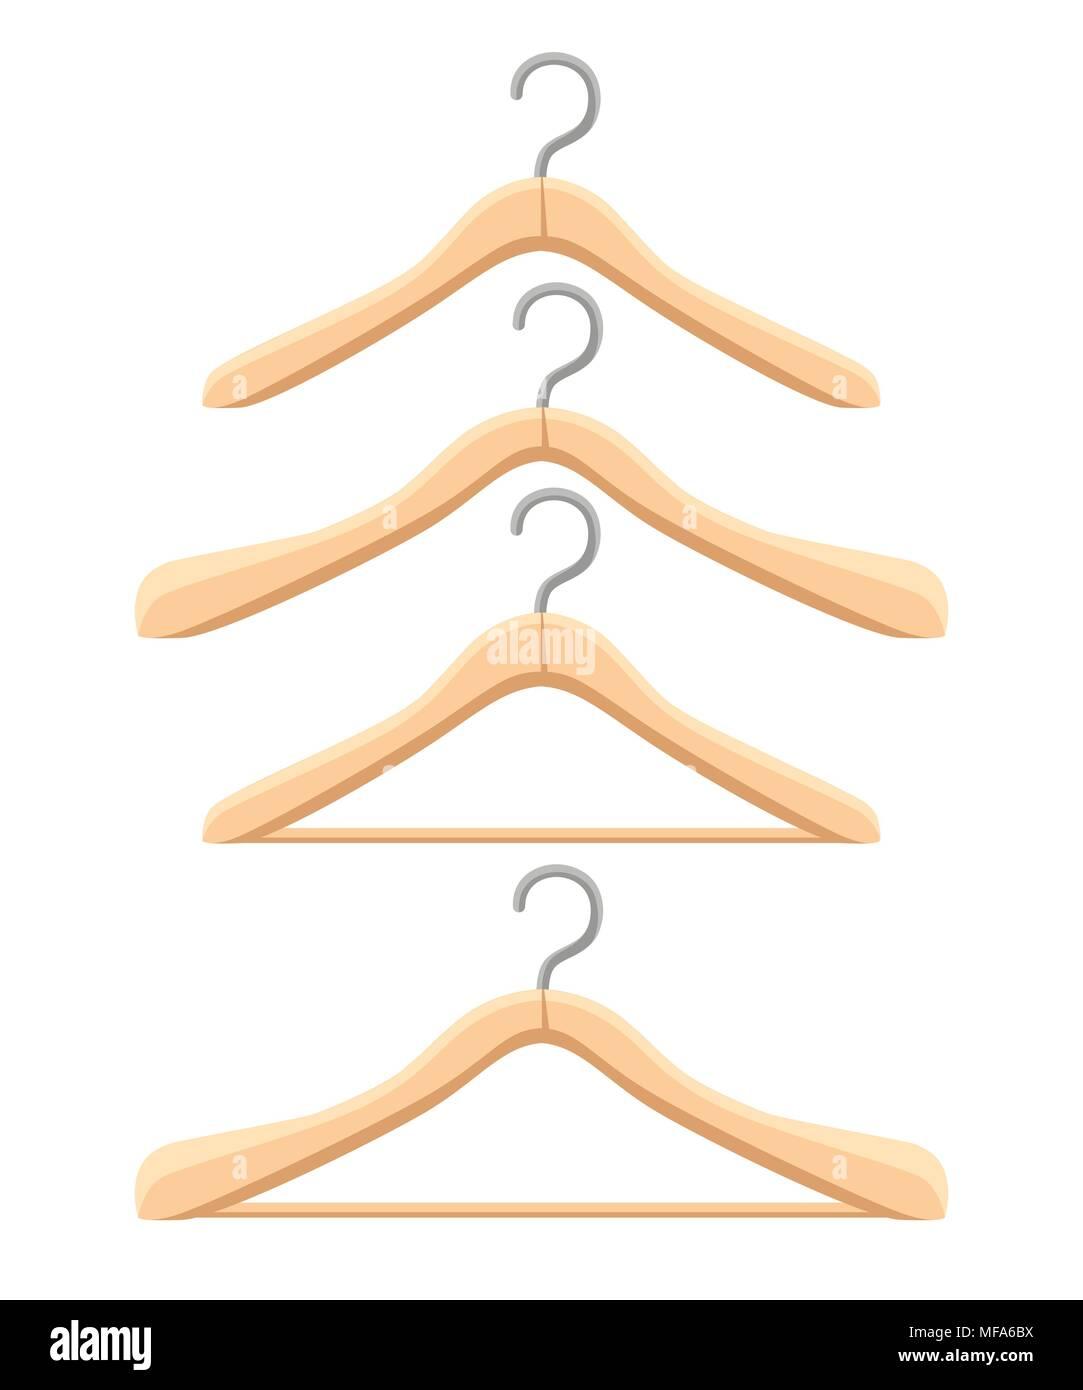 Wire Hangers Stock Vector Images - Alamy